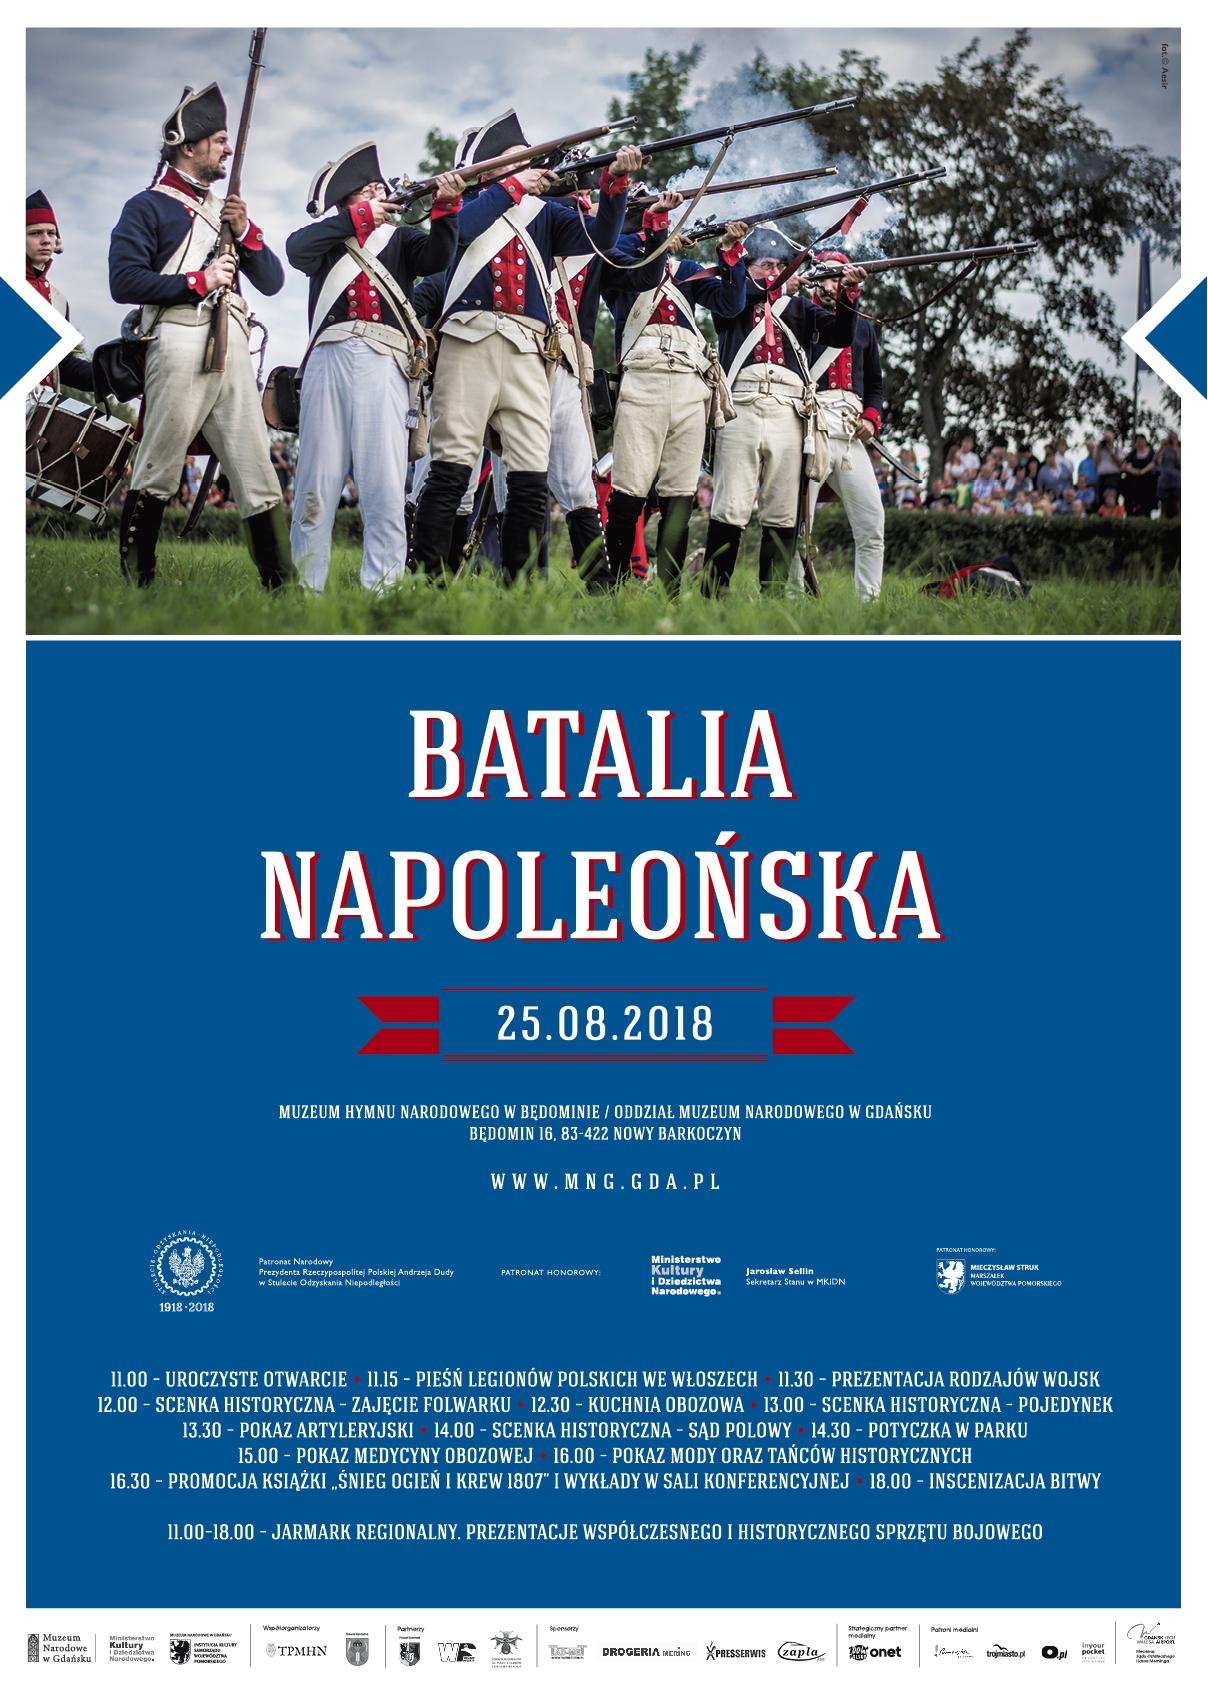 Batalia Napoleońska 2018 - plakat